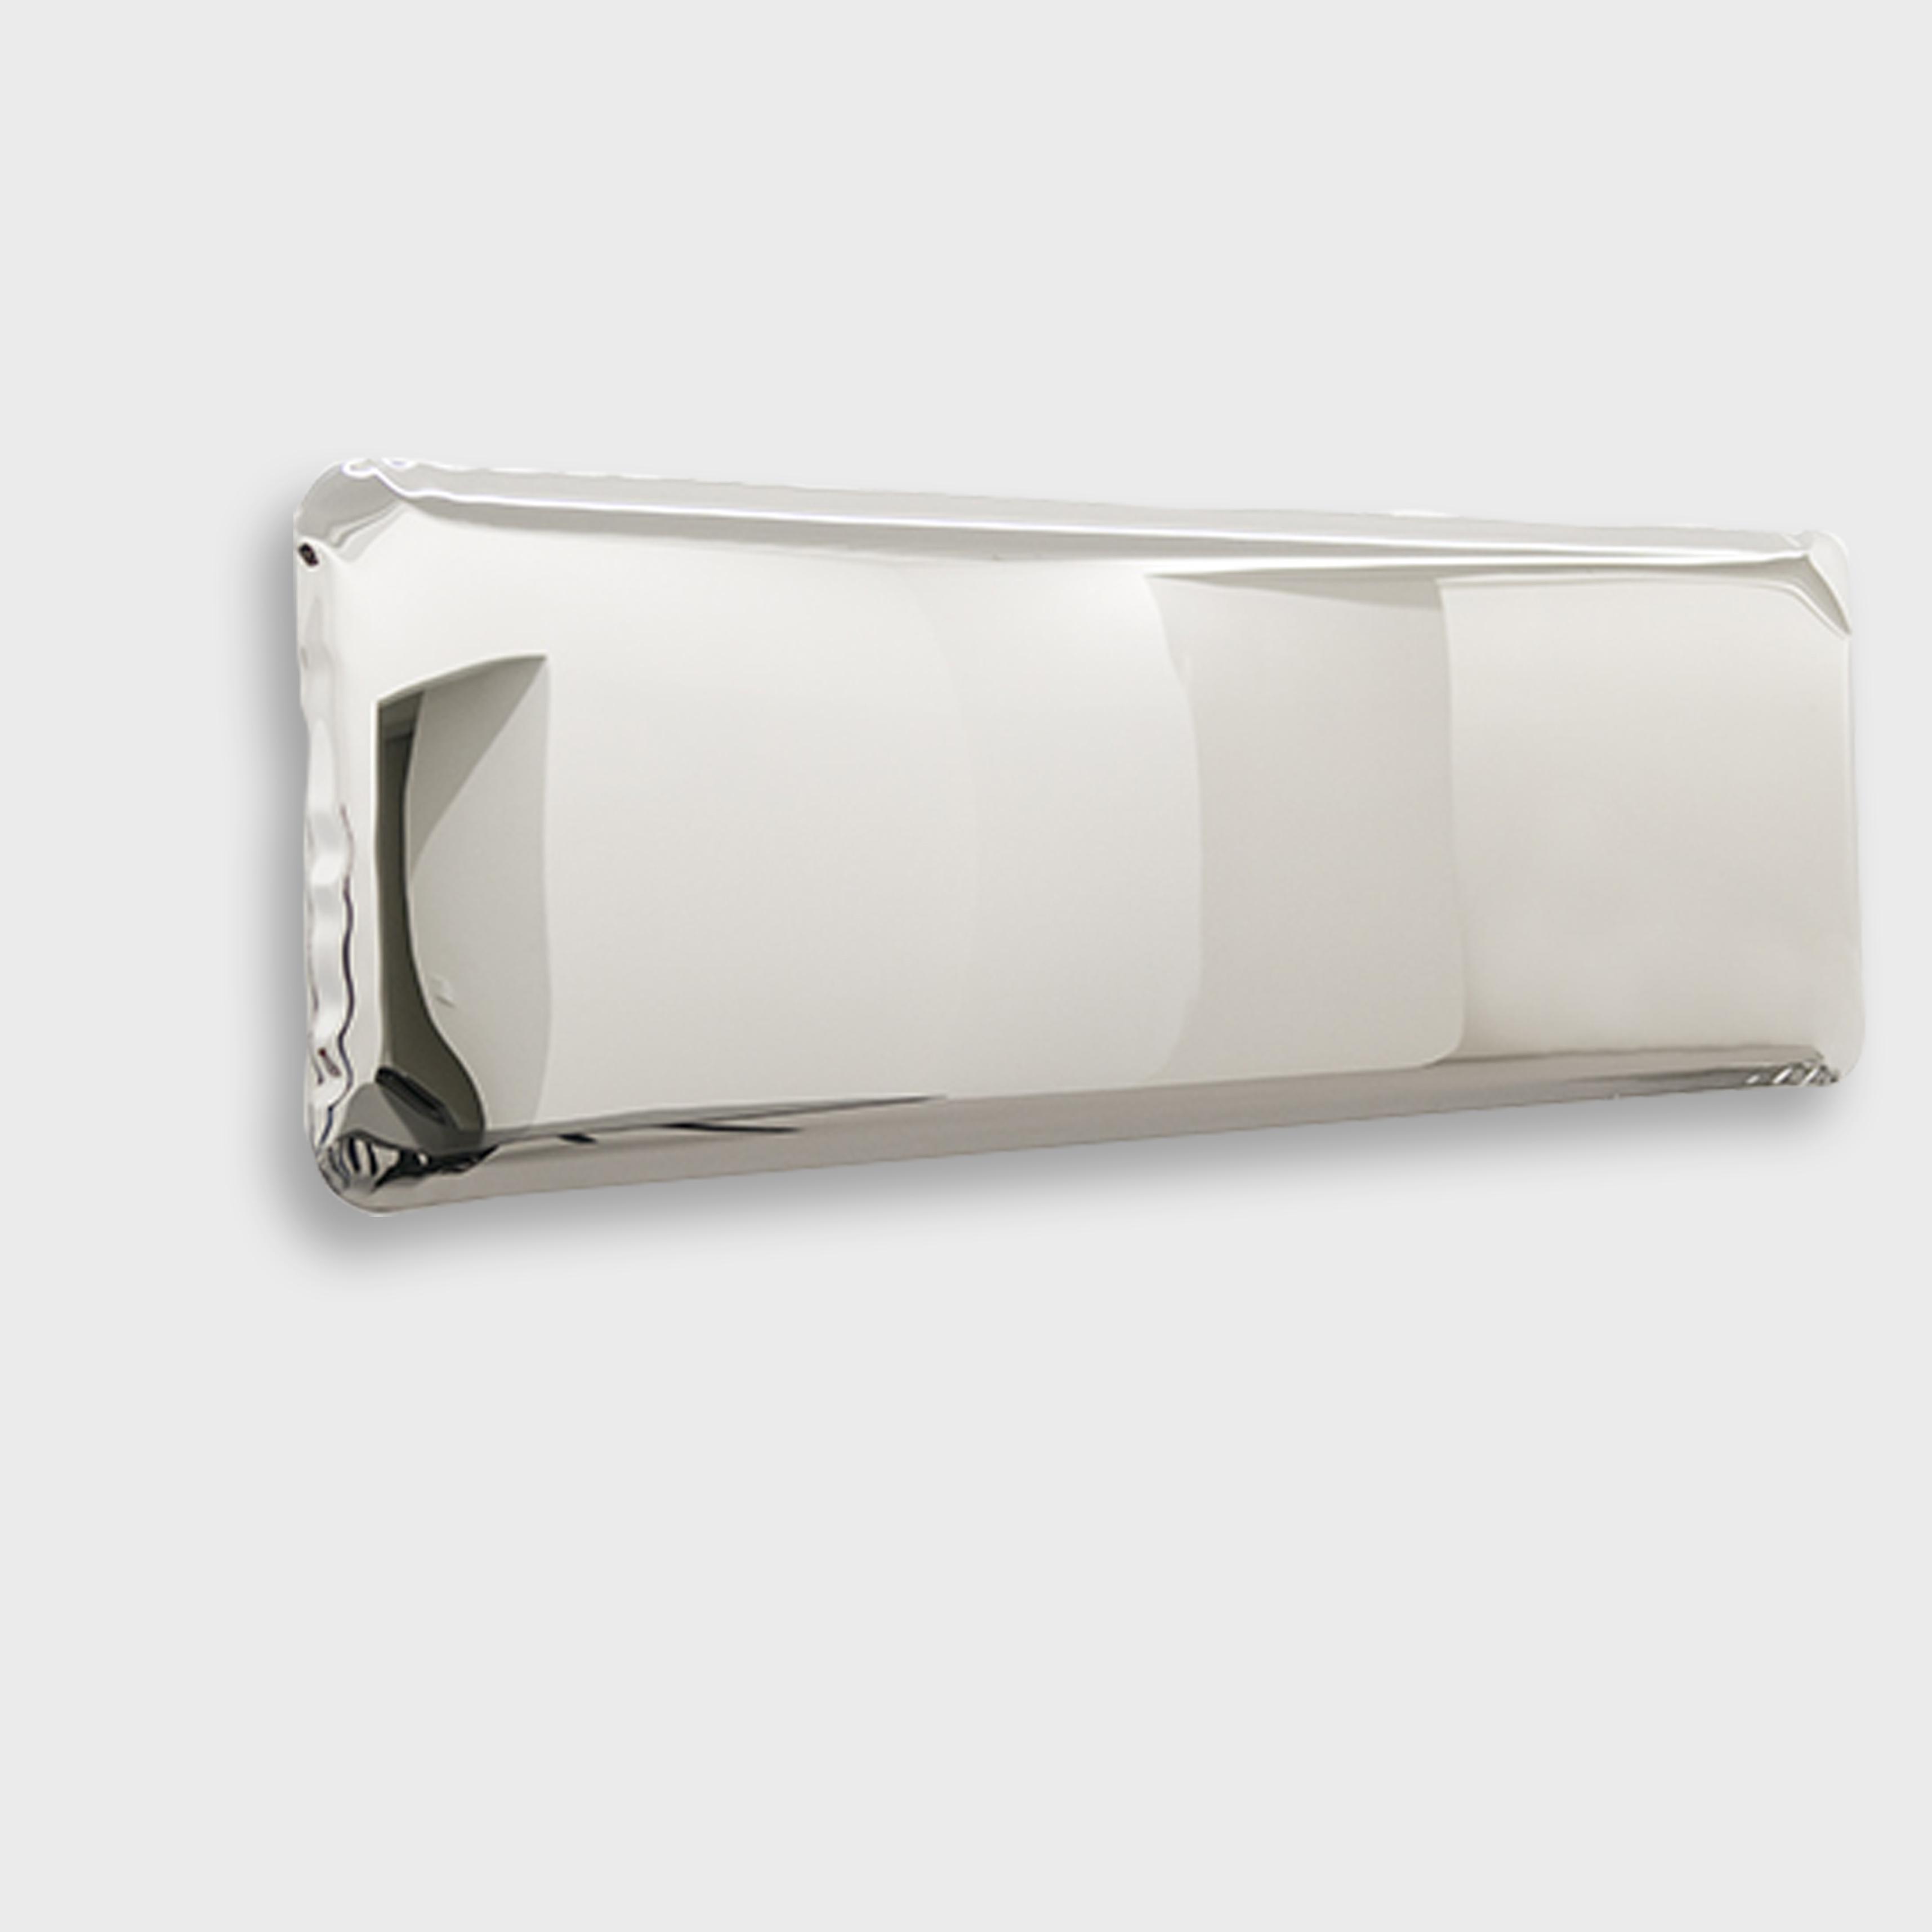 Tafla, mirror, Oskar Zieta, inflated metal, furniture, art, Metall spiegel aufgeblasener, lustro, color, miroir,